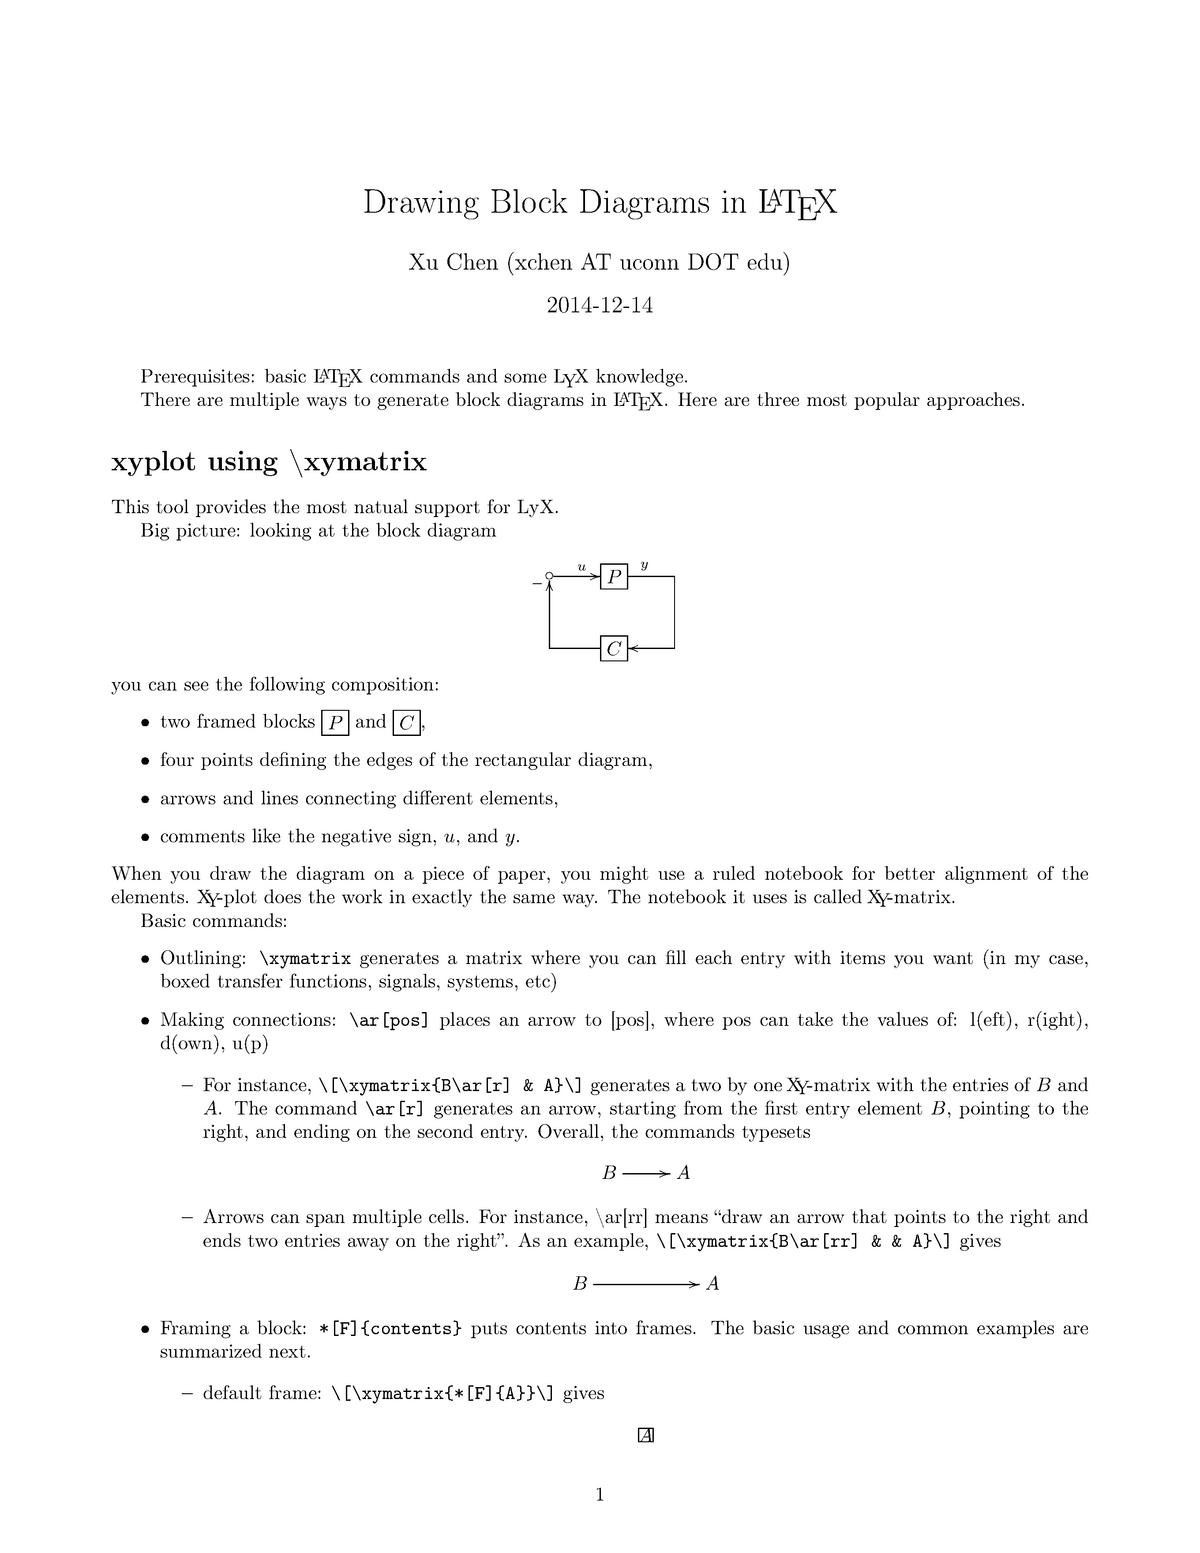 tutorial work - drawing block diagrams in latex - me 5895: special topics in  mech engr - studocu